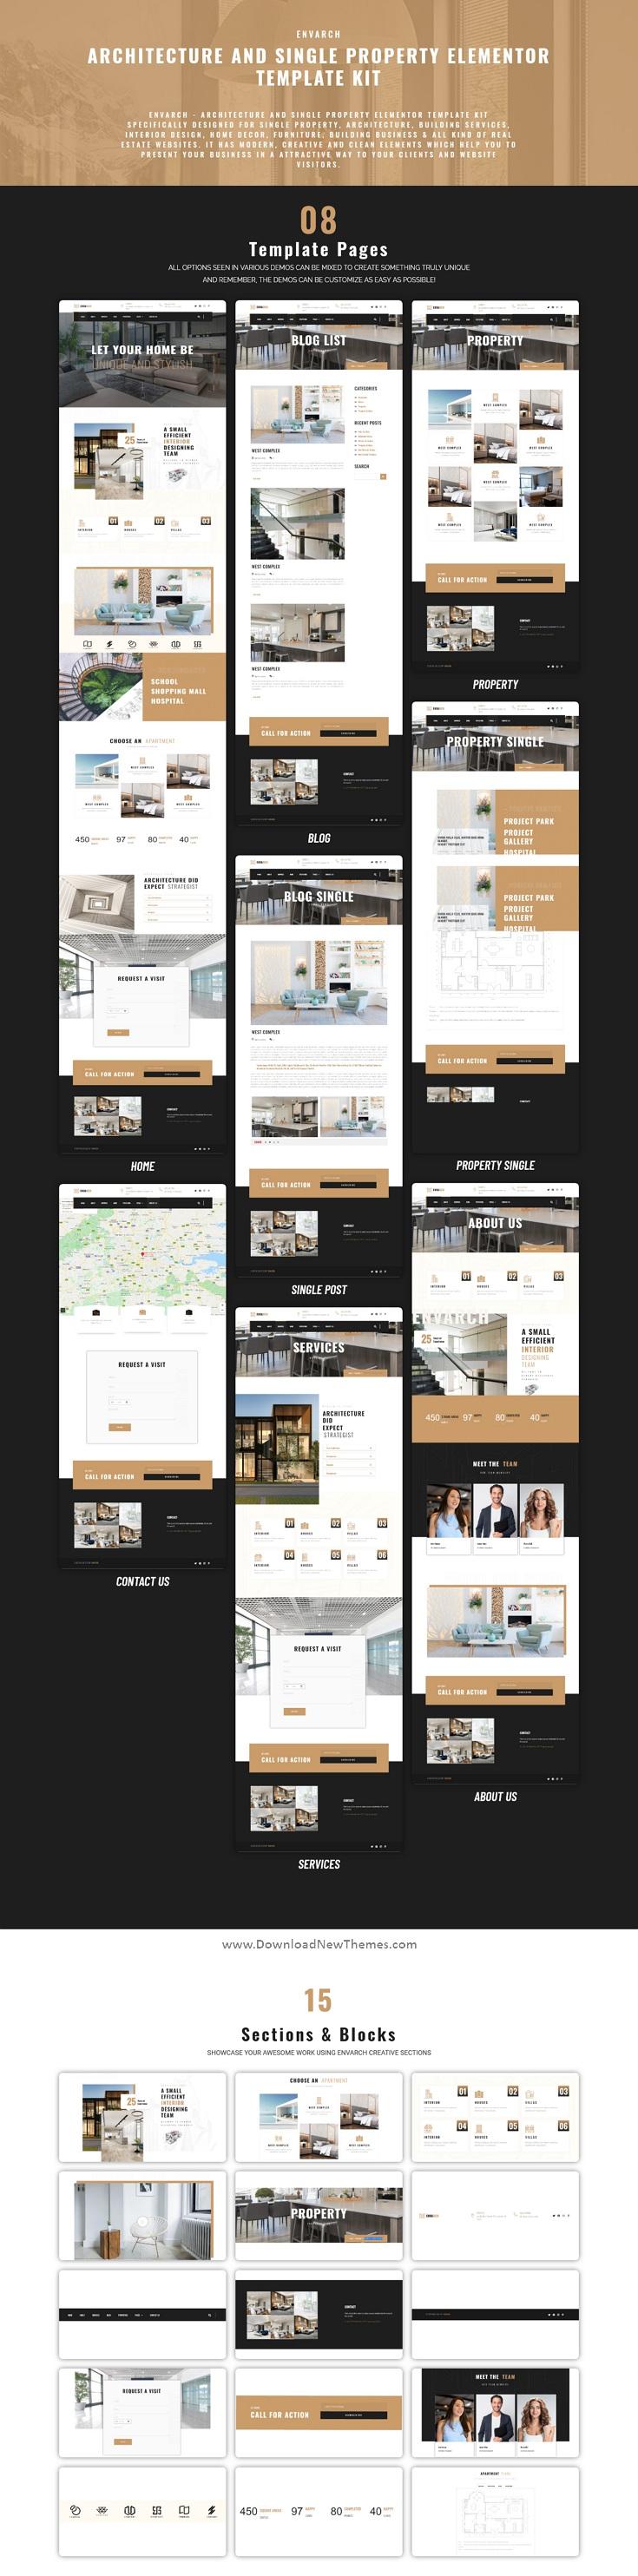 Architecture & Single Property Elementor Template Kit